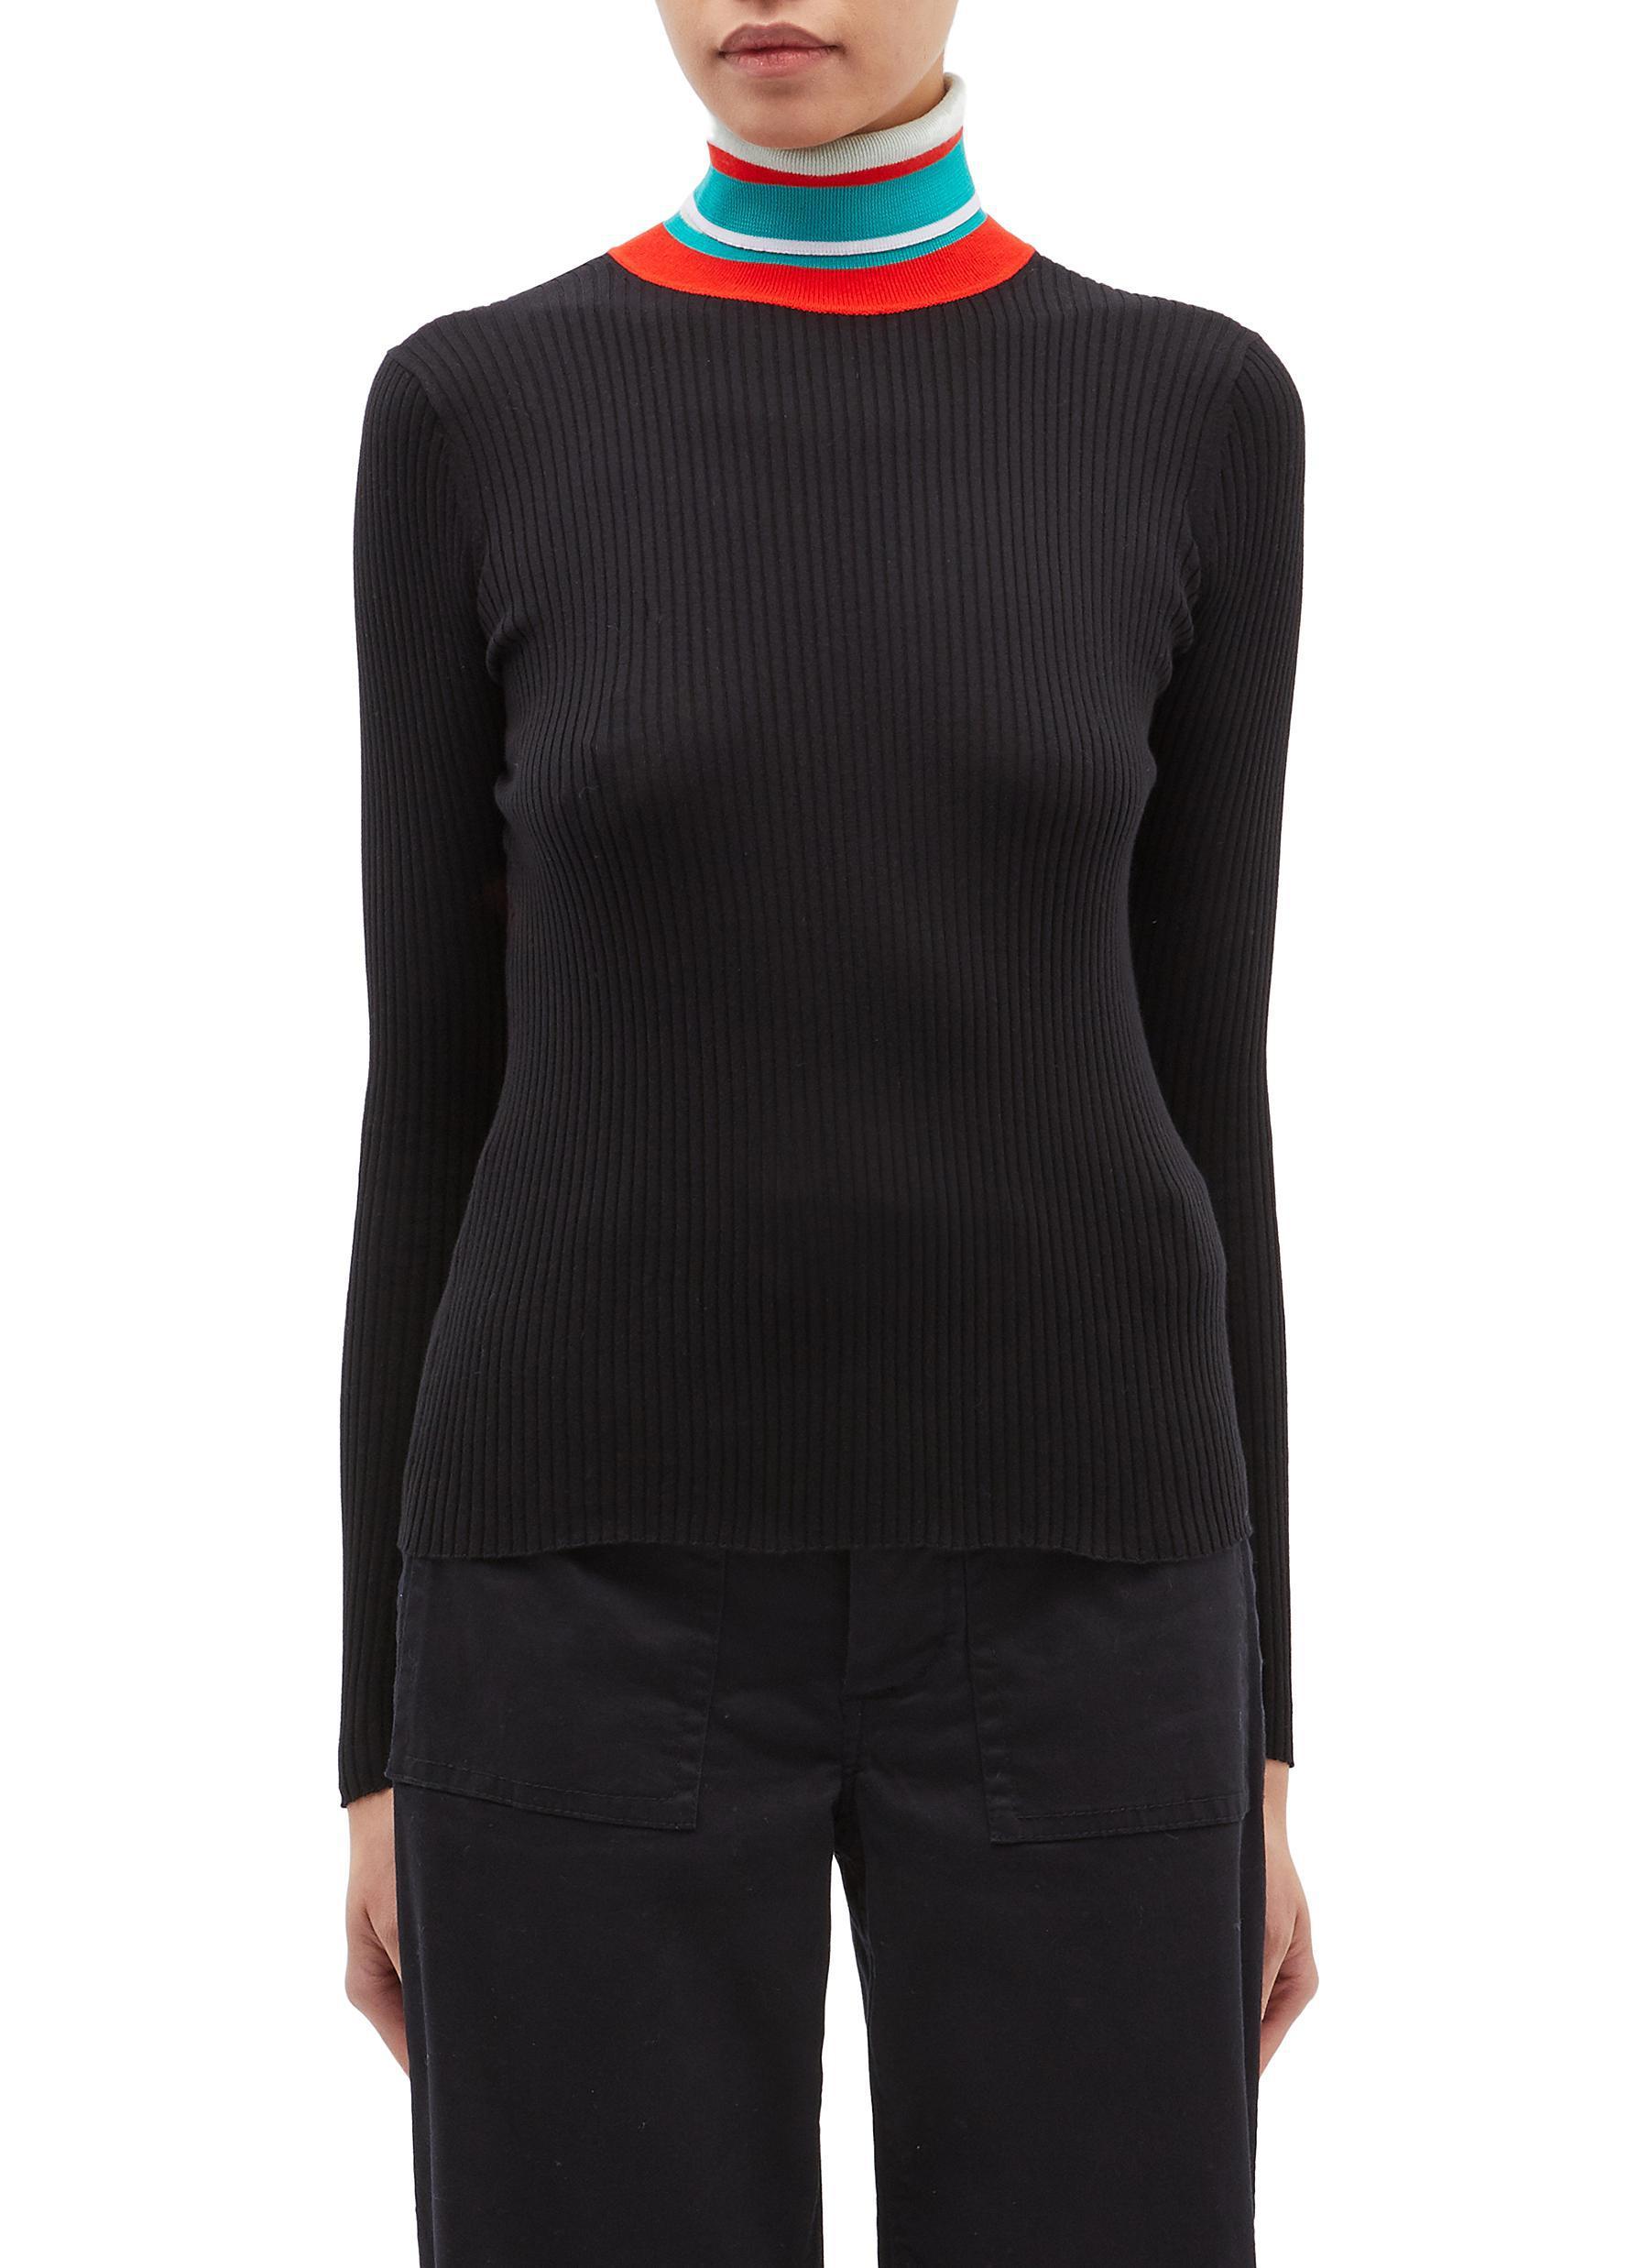 72329ad3e8c92 Proenza Schouler Pswl Contrast Stripe Rib Knit Turtleneck Sweater in ...